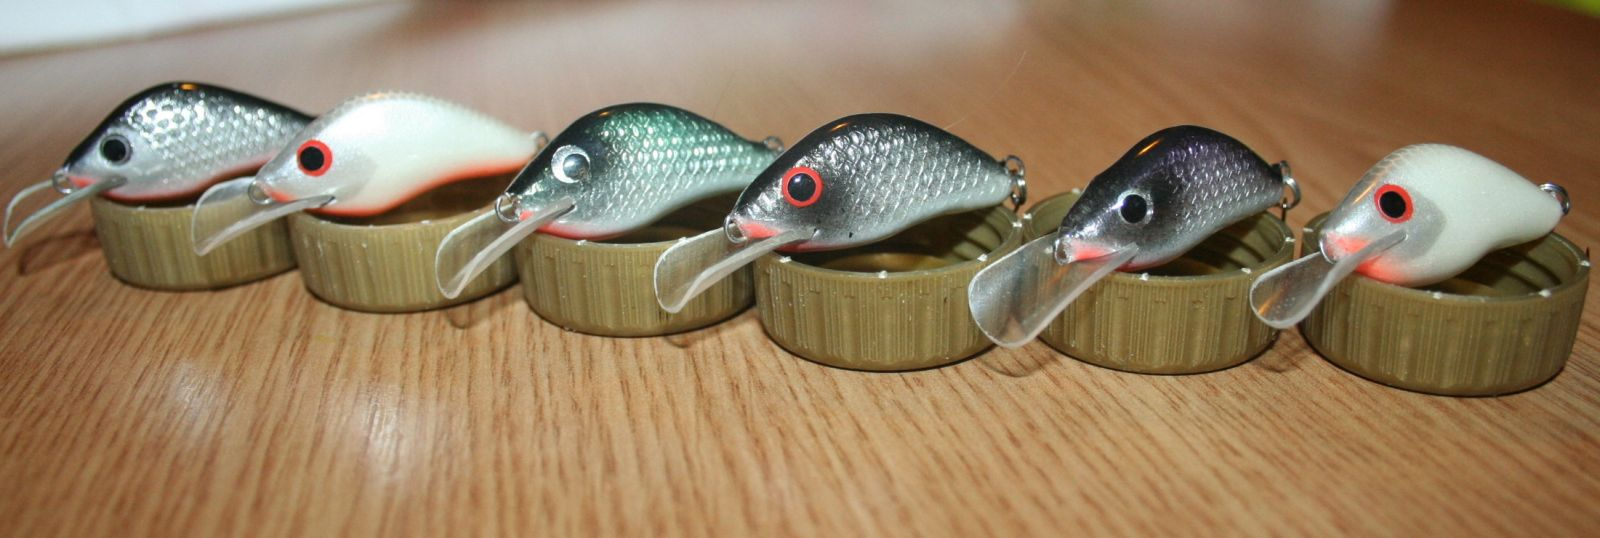 mini lures 3cm 3g sinking